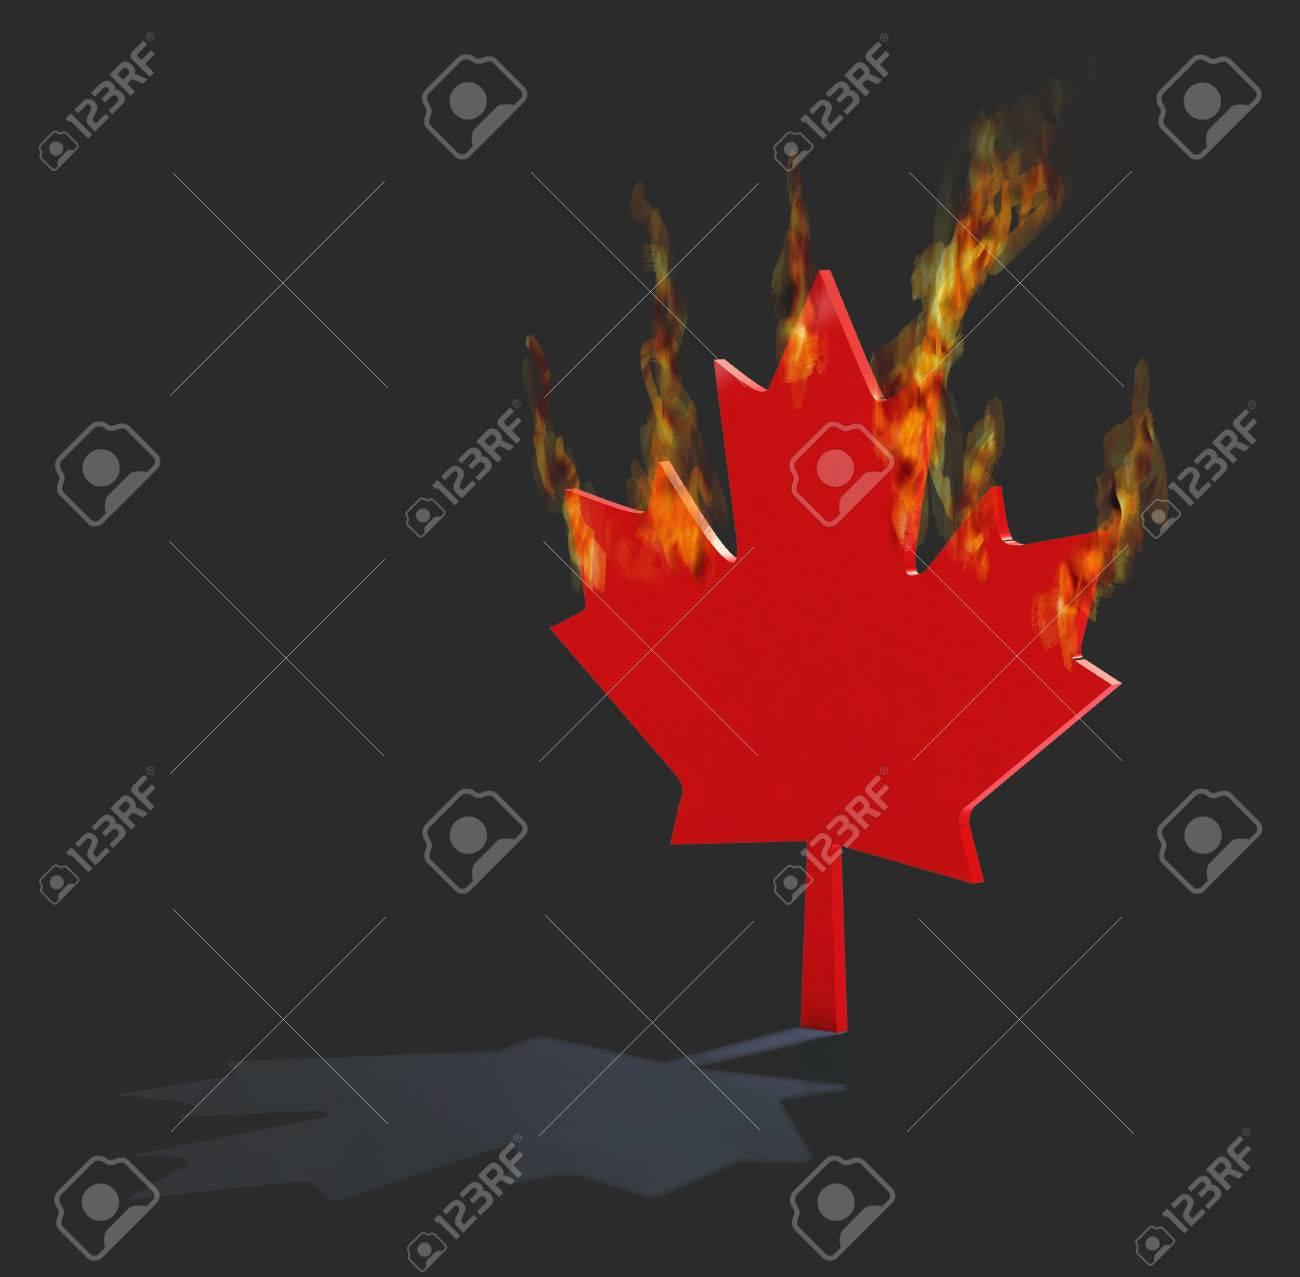 Maple Leaf Canadian Symbol Burning In Flame 3d Illustration Stock